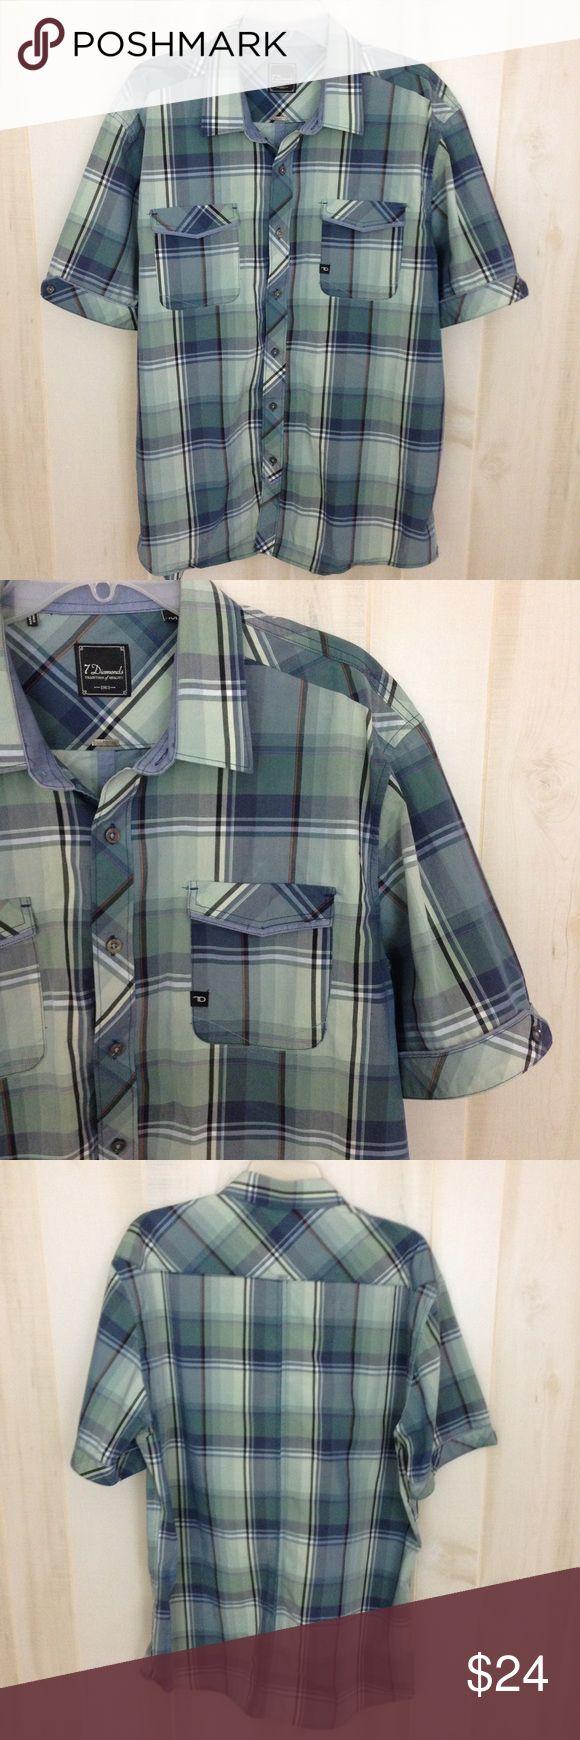 Shirt design measurements - 7 Diamonds Green Blue Plaid Diamonds Shirt Xxl Brand 7 Diamonds Style Men S Button